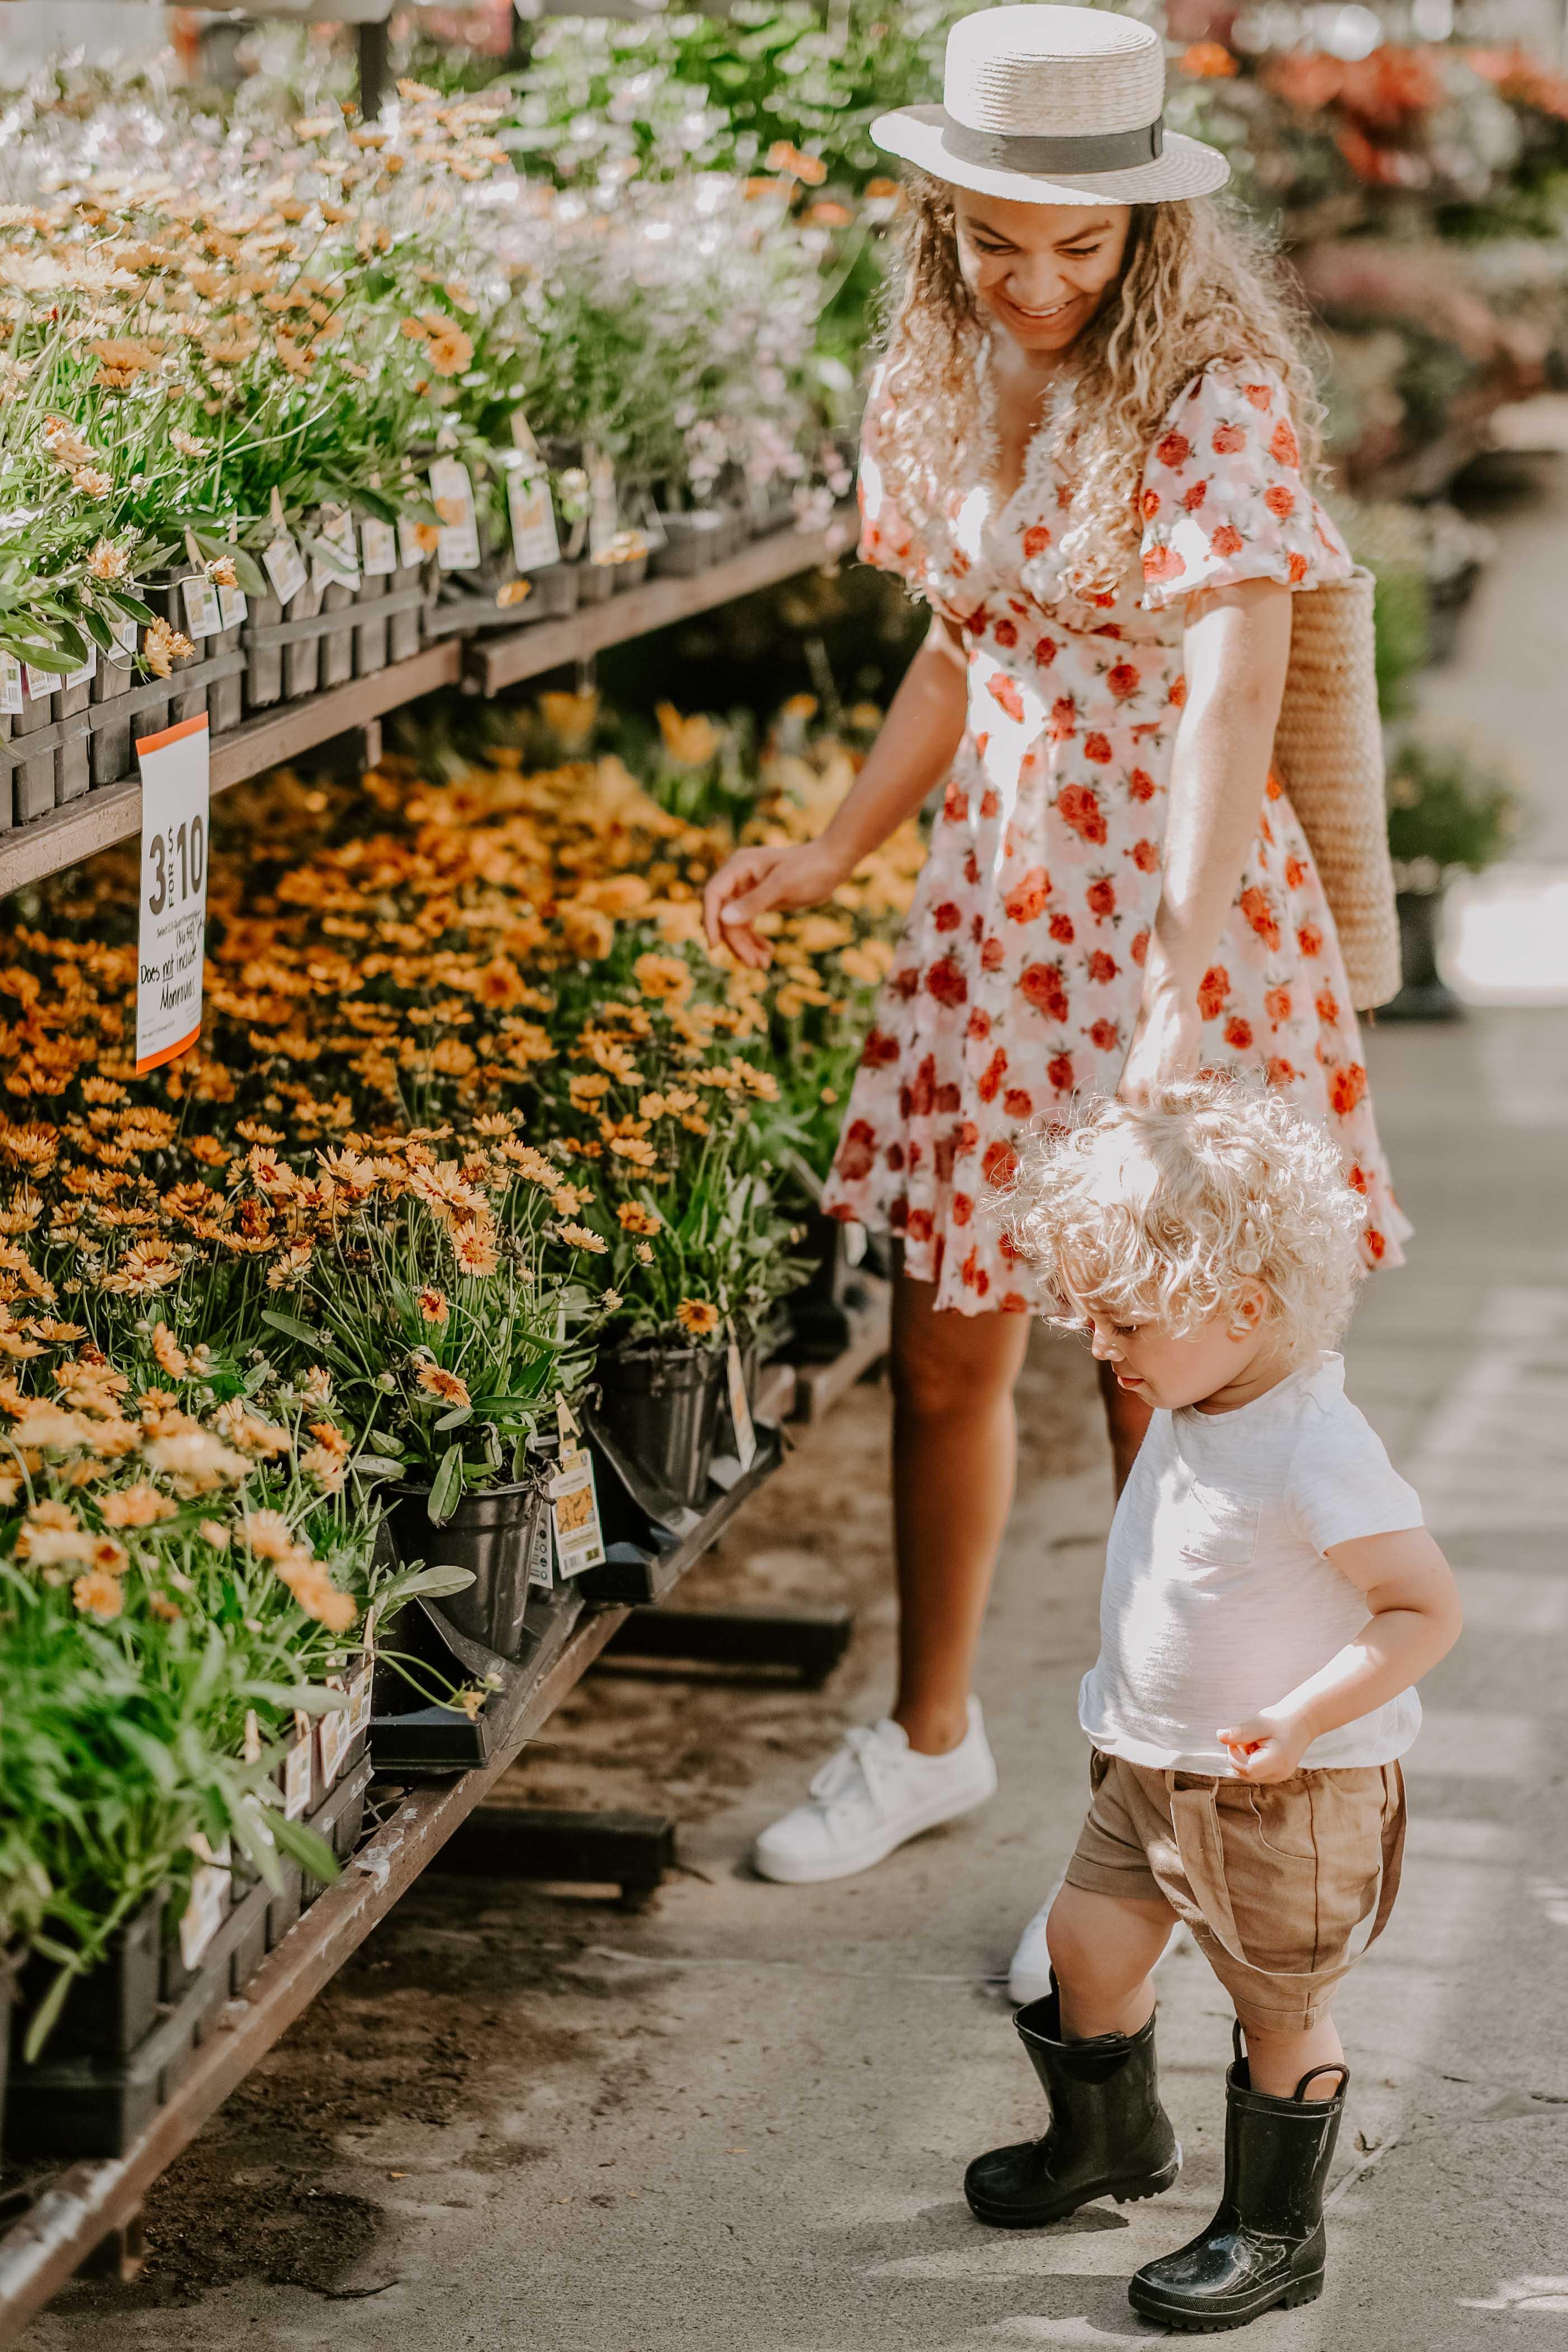 lowes garden center